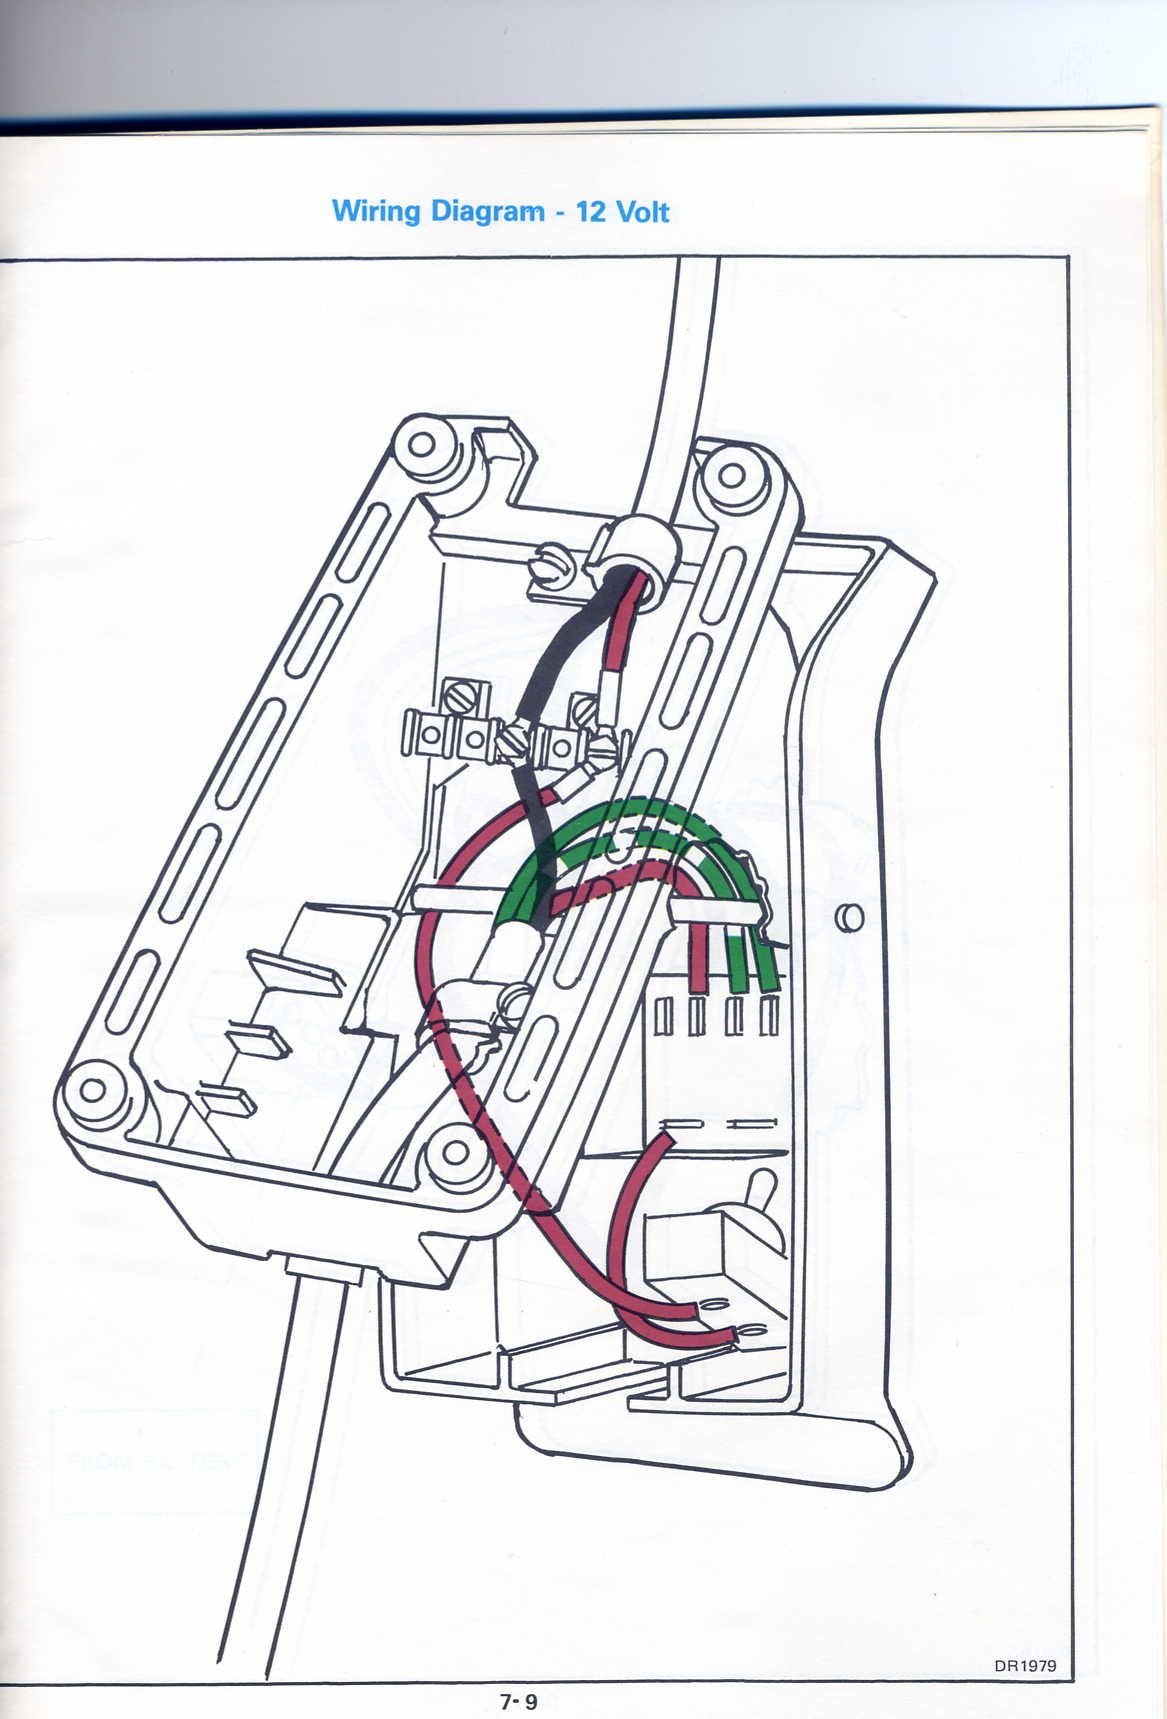 Motorguide Trolling Motor Wiring Diagram: Trying To Repair A Friends - Motorguide Trolling Motor Wiring Diagram